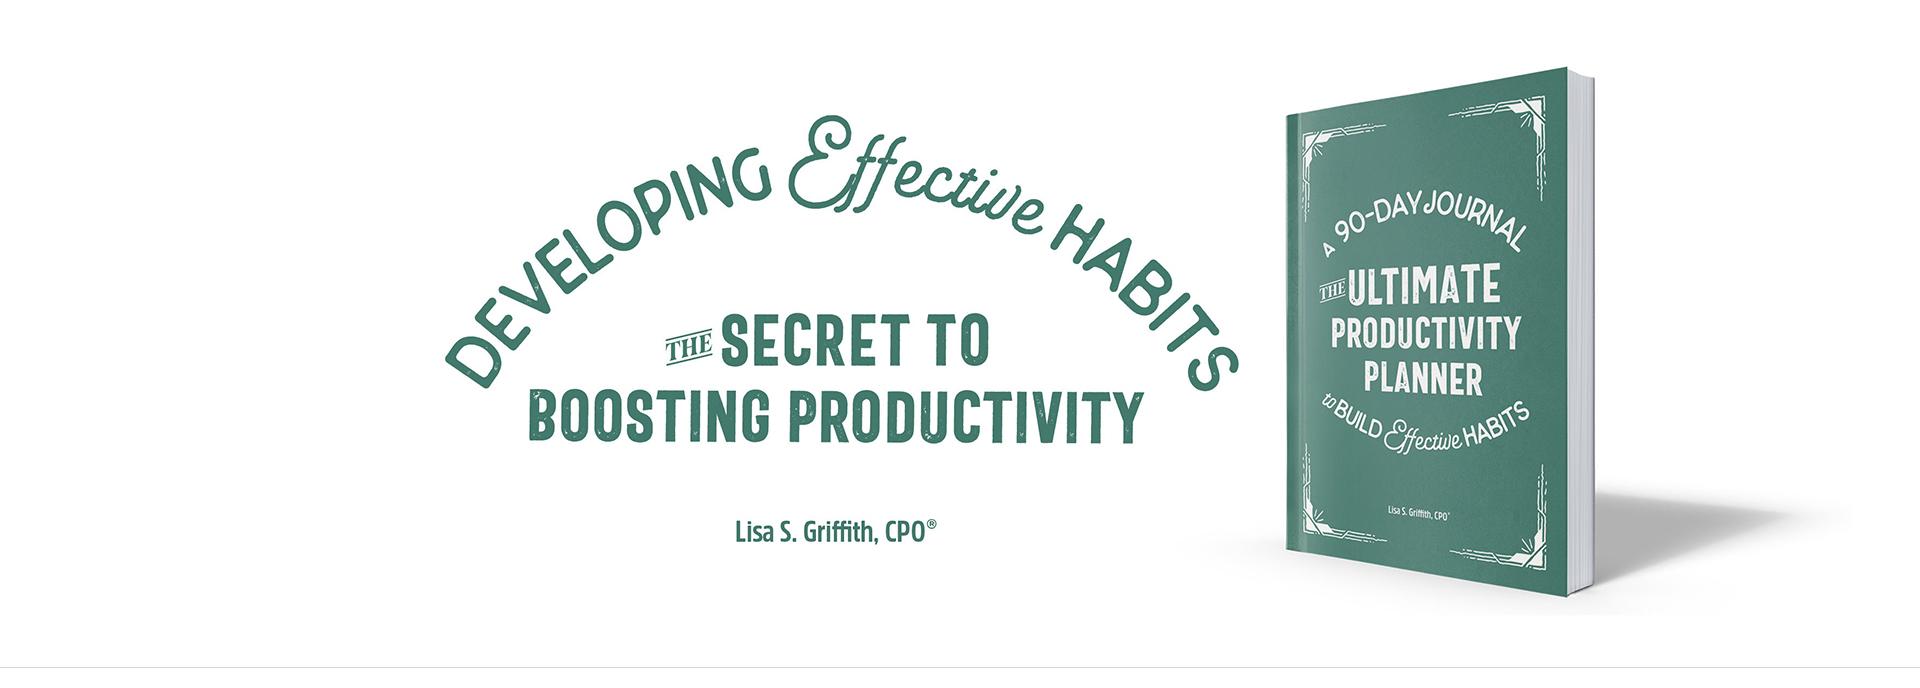 Developing Effective Habits